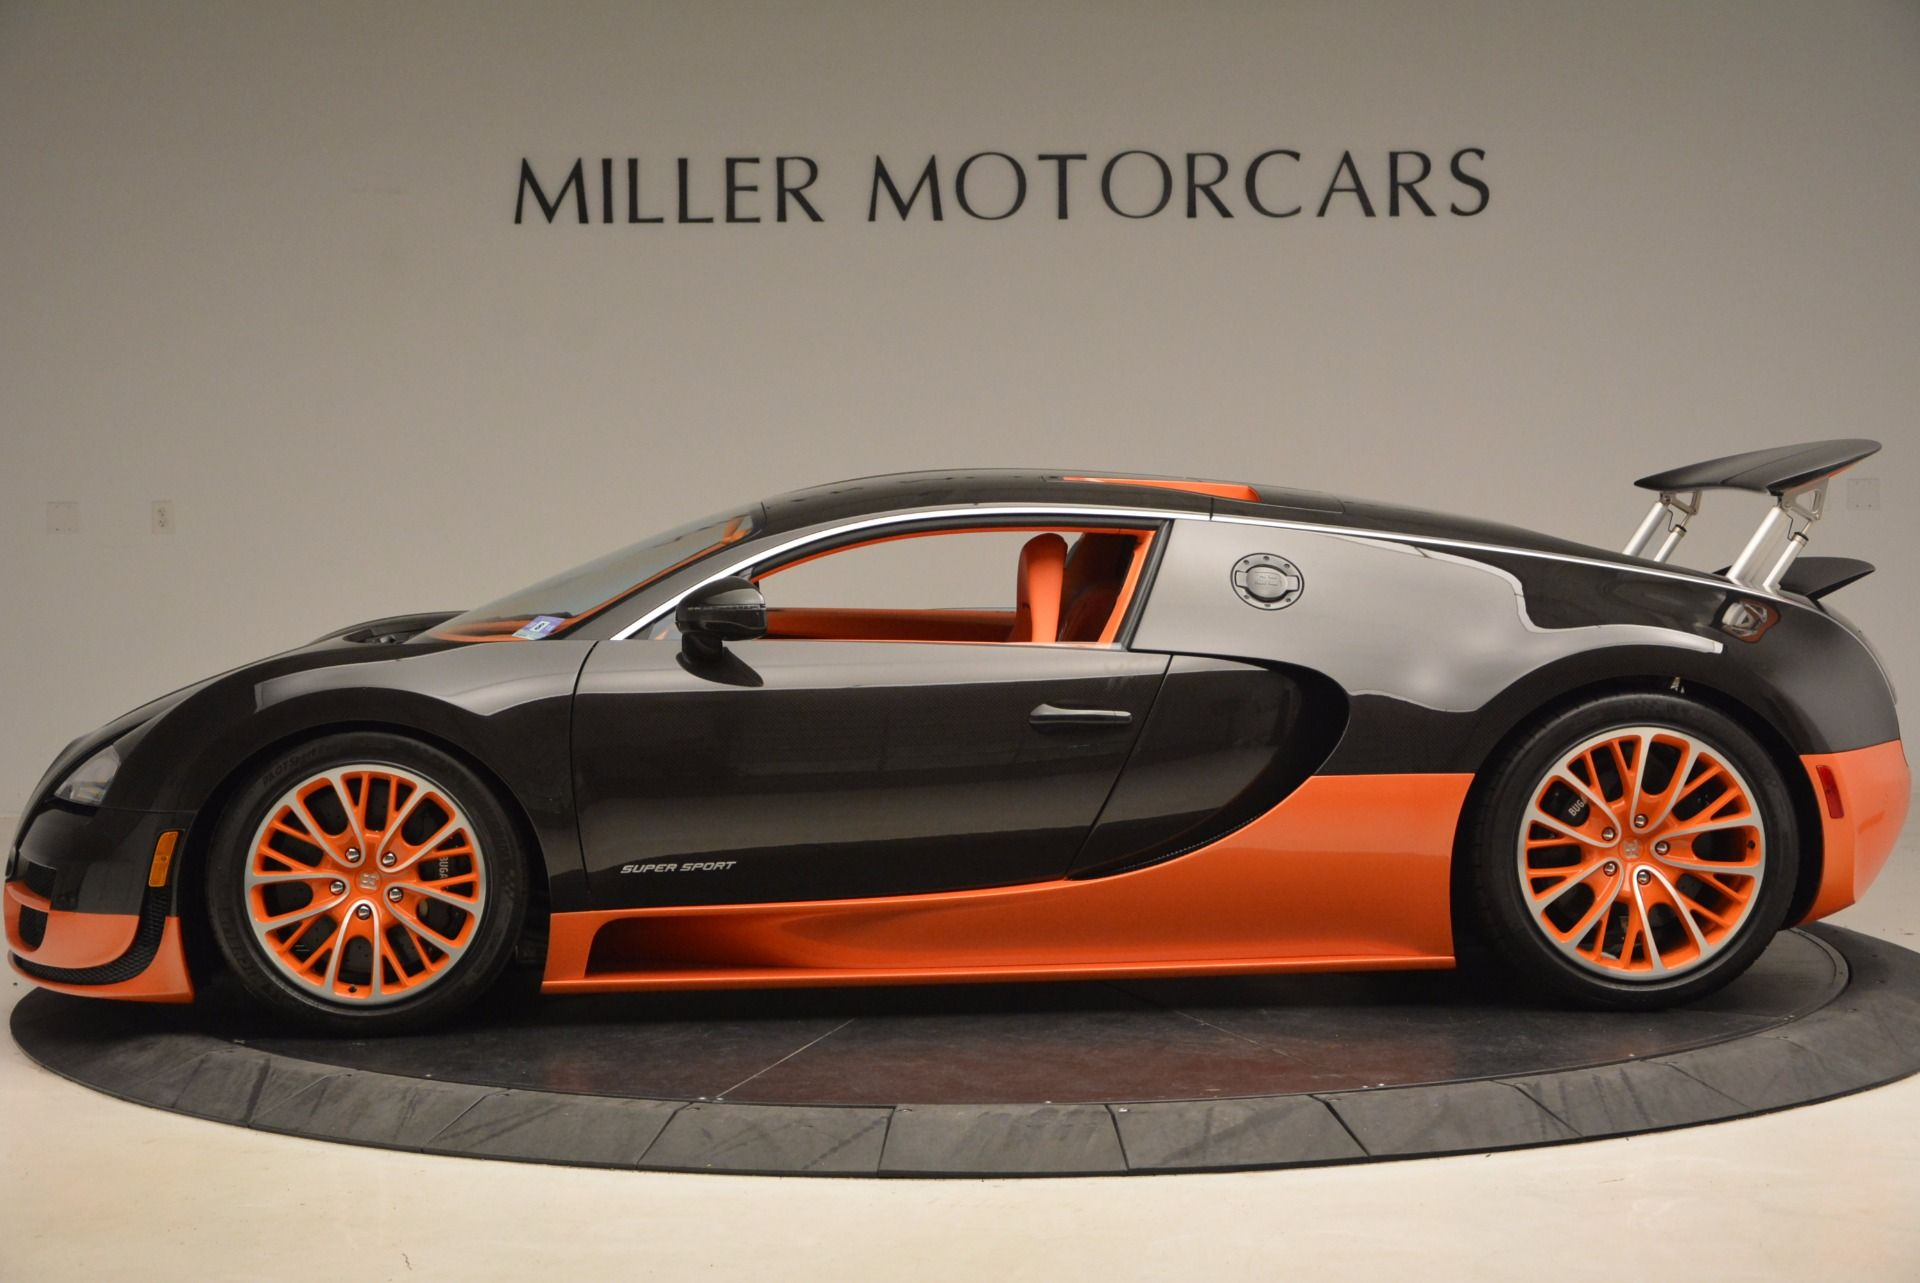 Bugatti Veyron Super Sports Wallpaper Bugatti Veyron Super Sport Bugatti Veyron Veyron